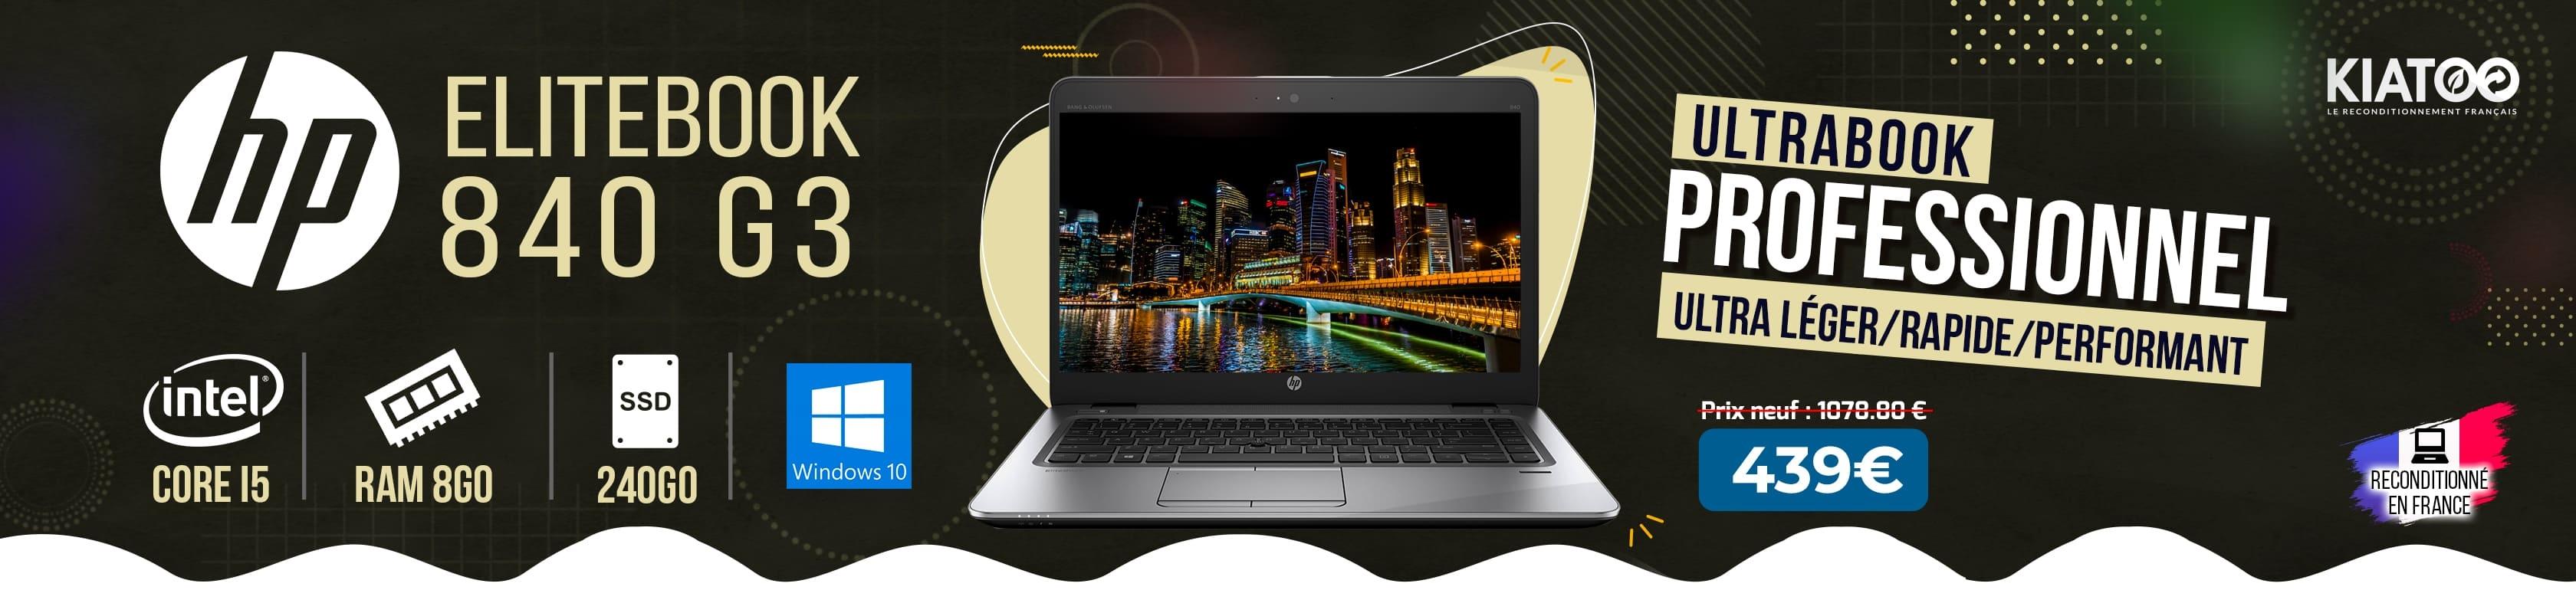 HP EliteBook 840 G3 i5 8Go RAM 240Go SSD Windows 10